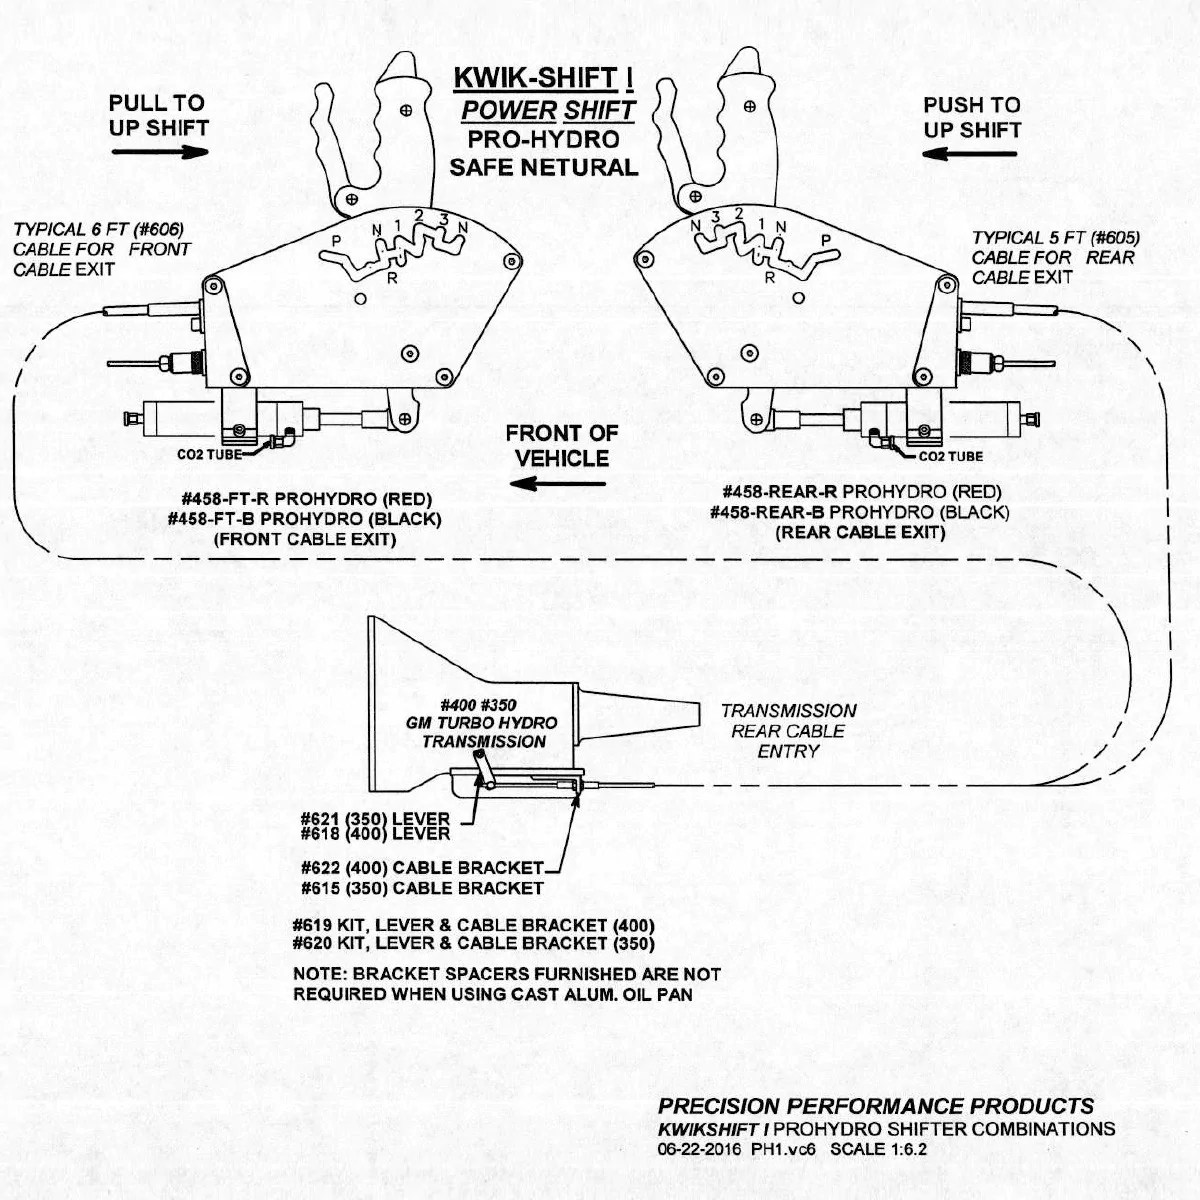 small resolution of th400 sensor diagram wiring diagrams scematic th400 no reverse th400 sensor diagram